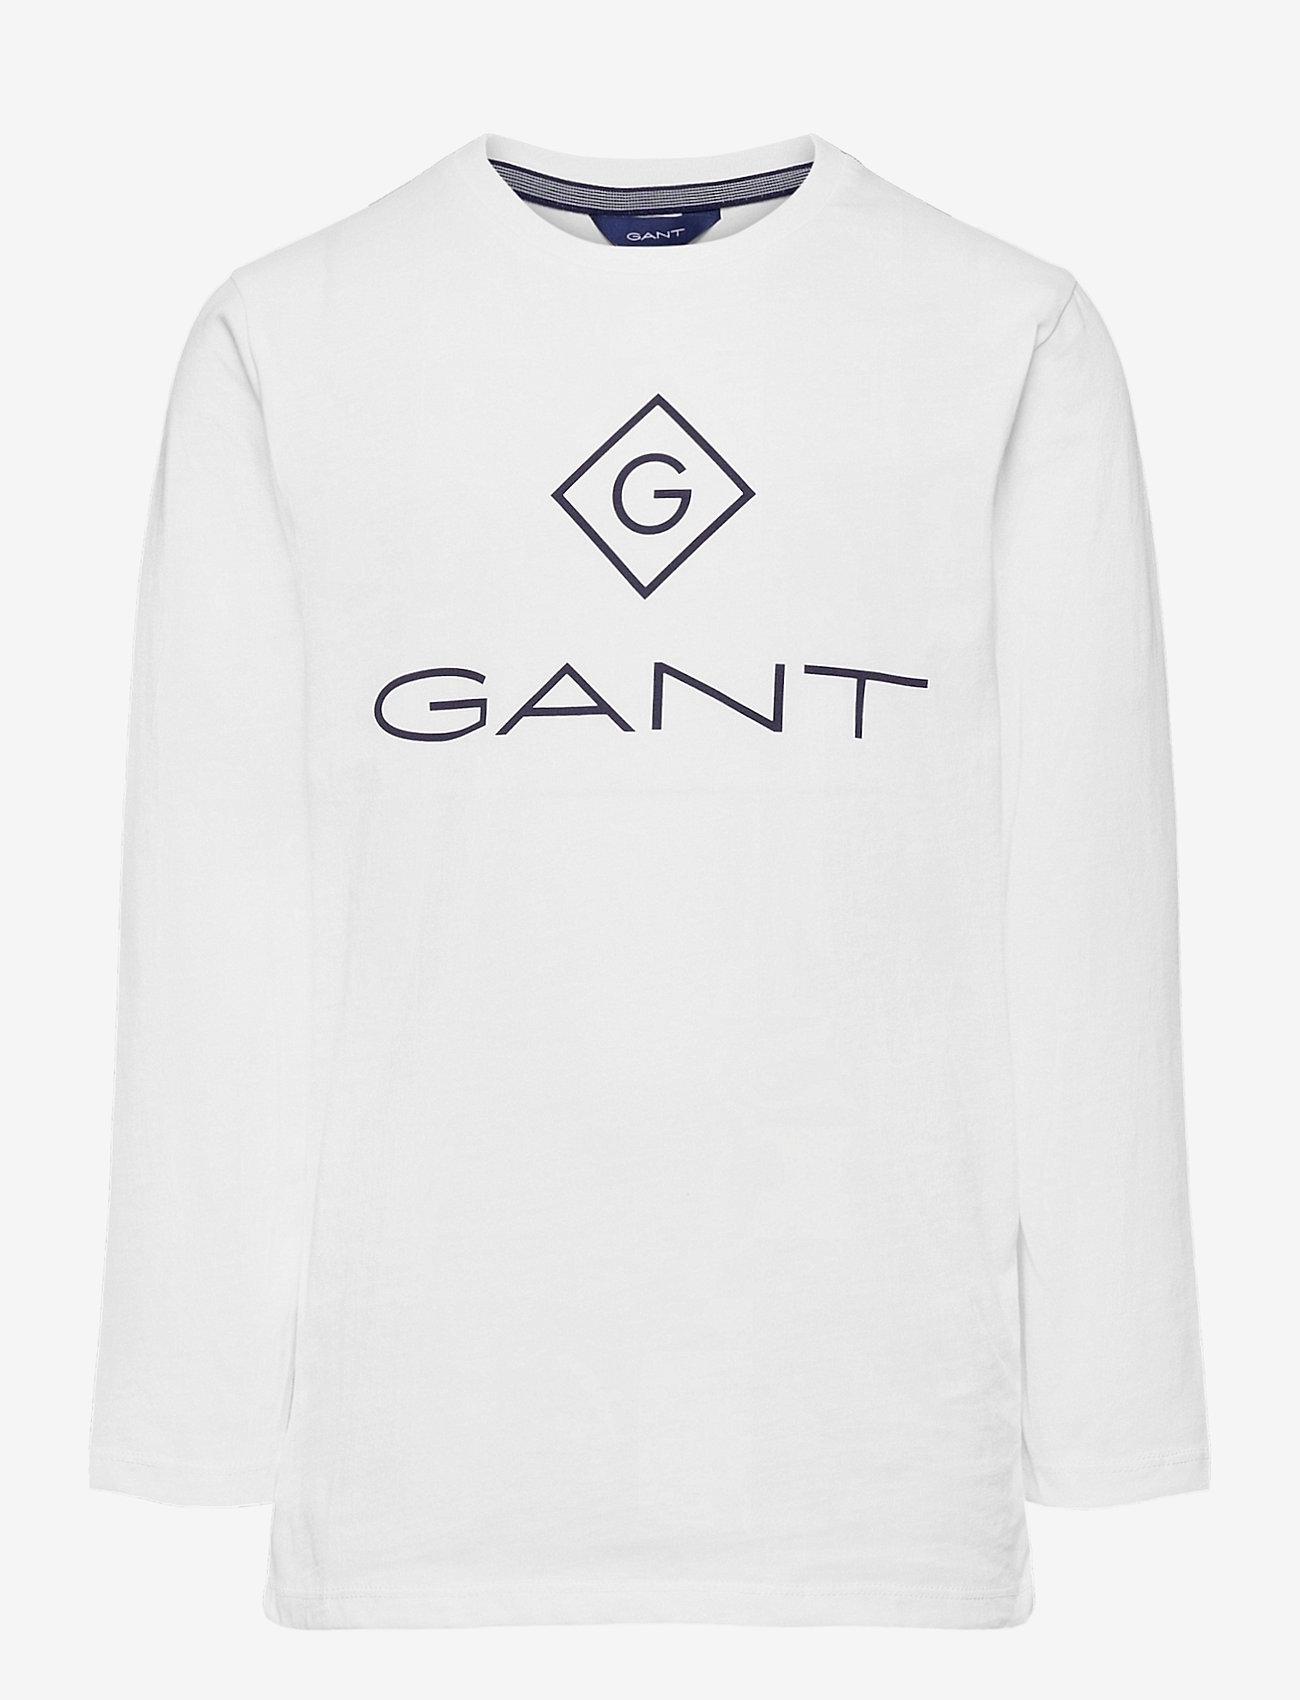 GANT - GANT LOCK-UP LS T-SHIRT - long-sleeved t-shirts - white - 0